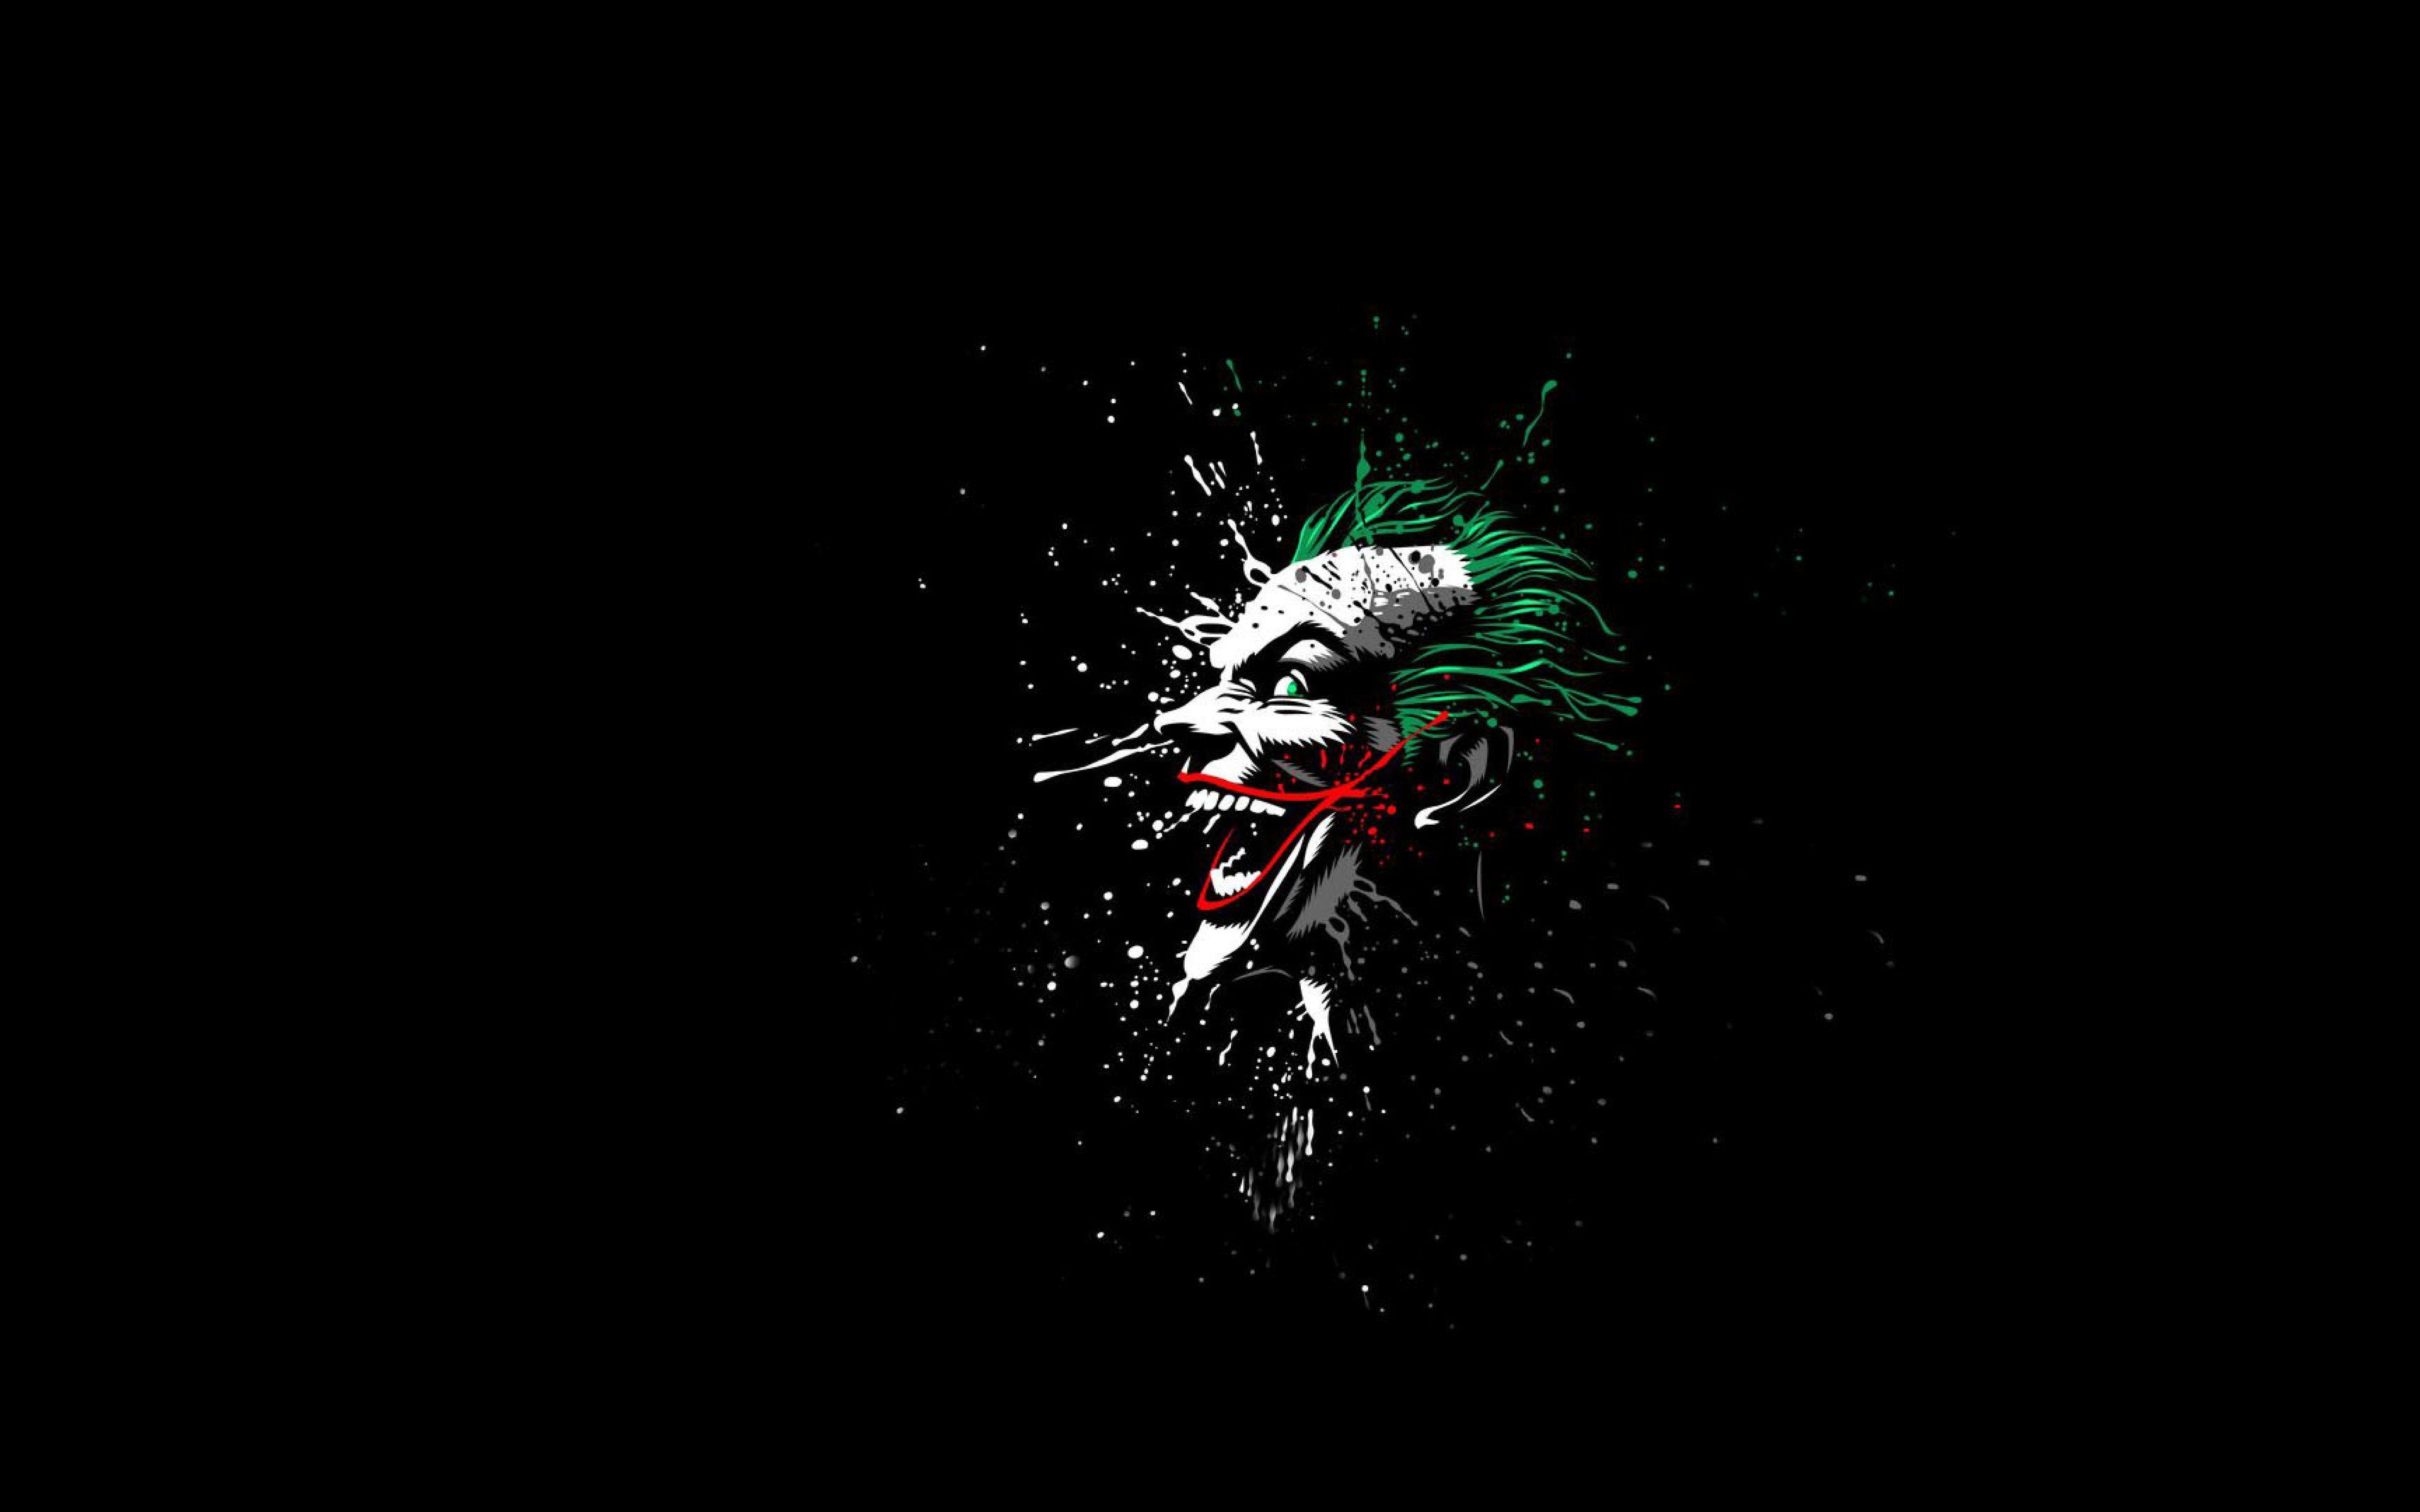 Danger Joker Wallpapers - Wallpaper Cave